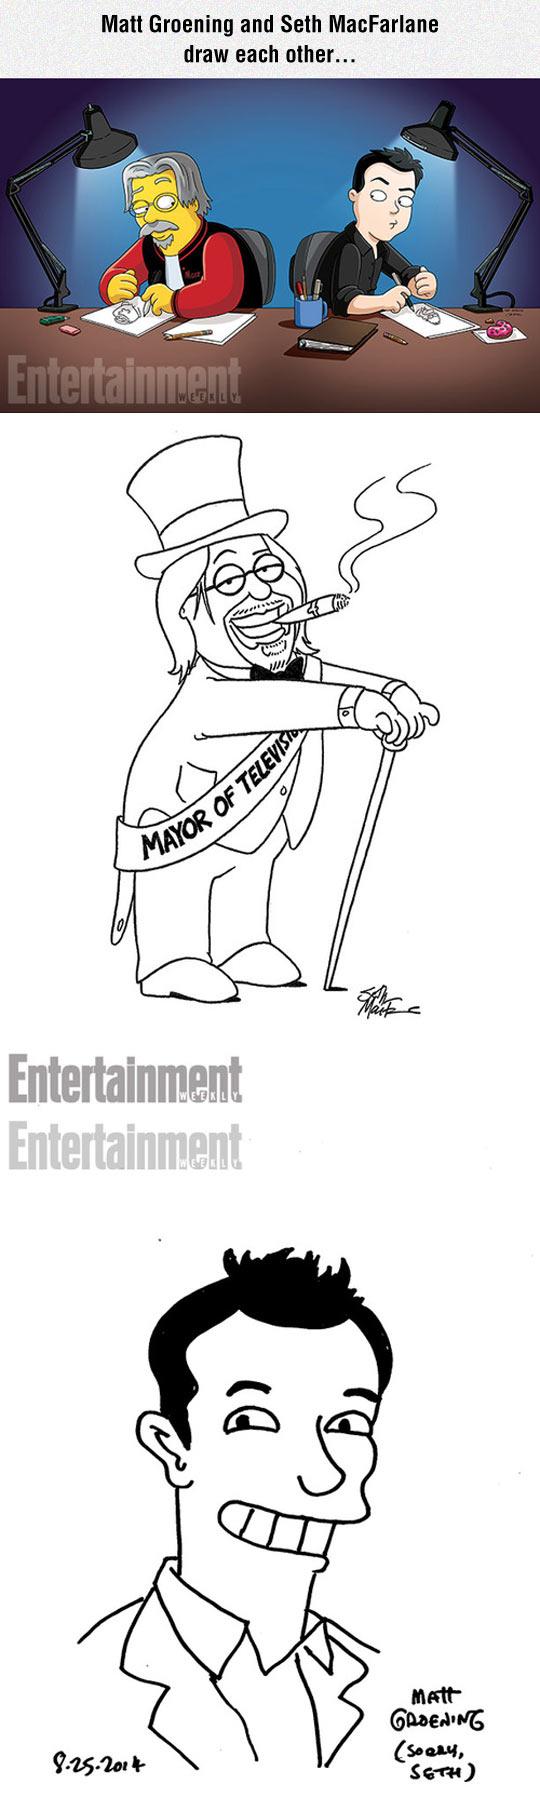 funny-Matt-Groening-Seth-MacFarlane-drawing-each-other